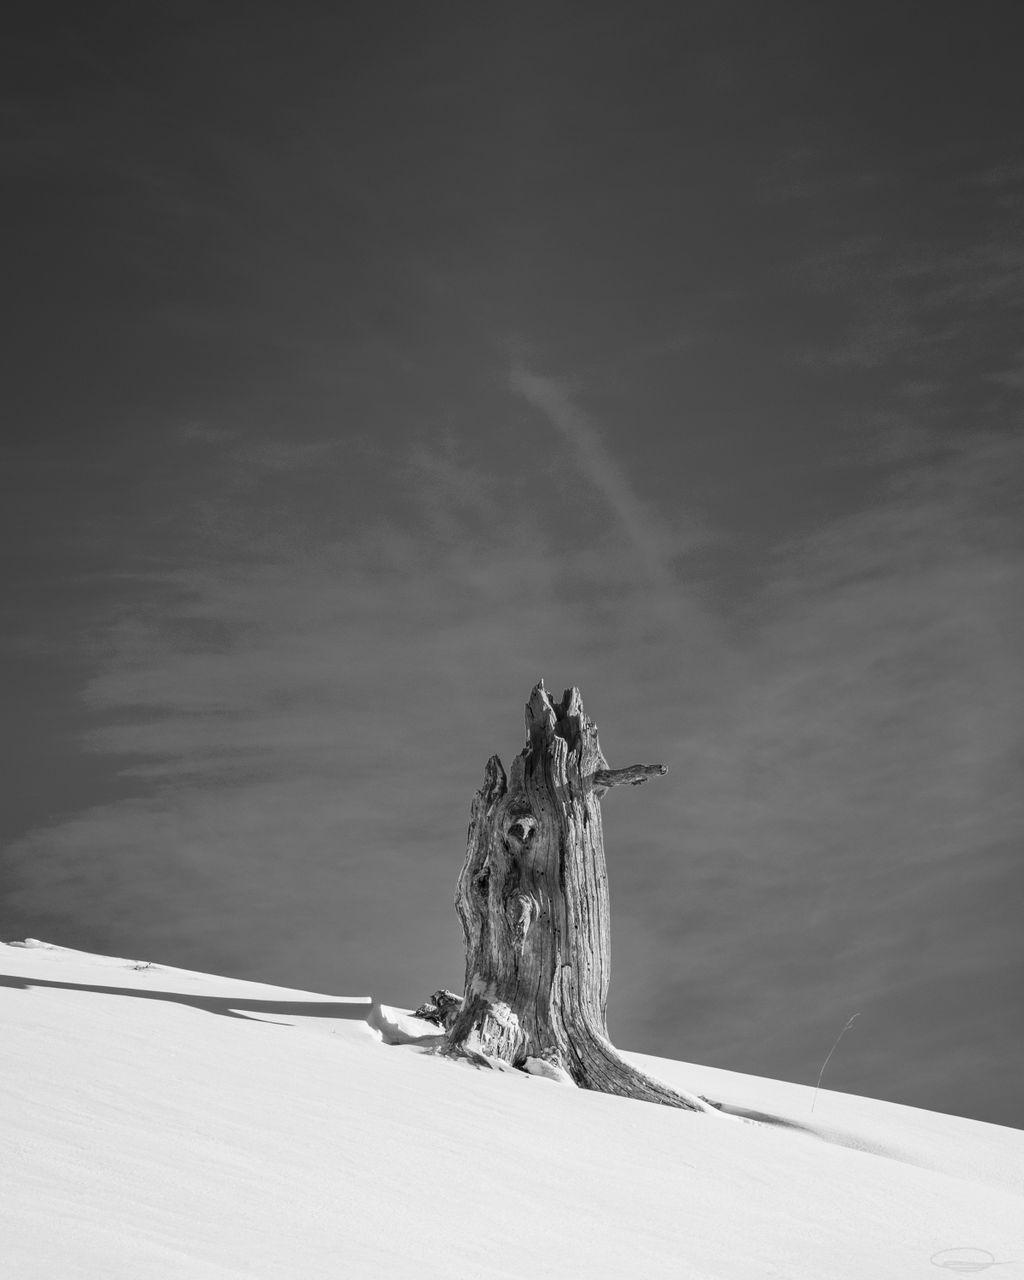 Tree Stump in the Snow on the Dobratsch Mountain - Monochrome